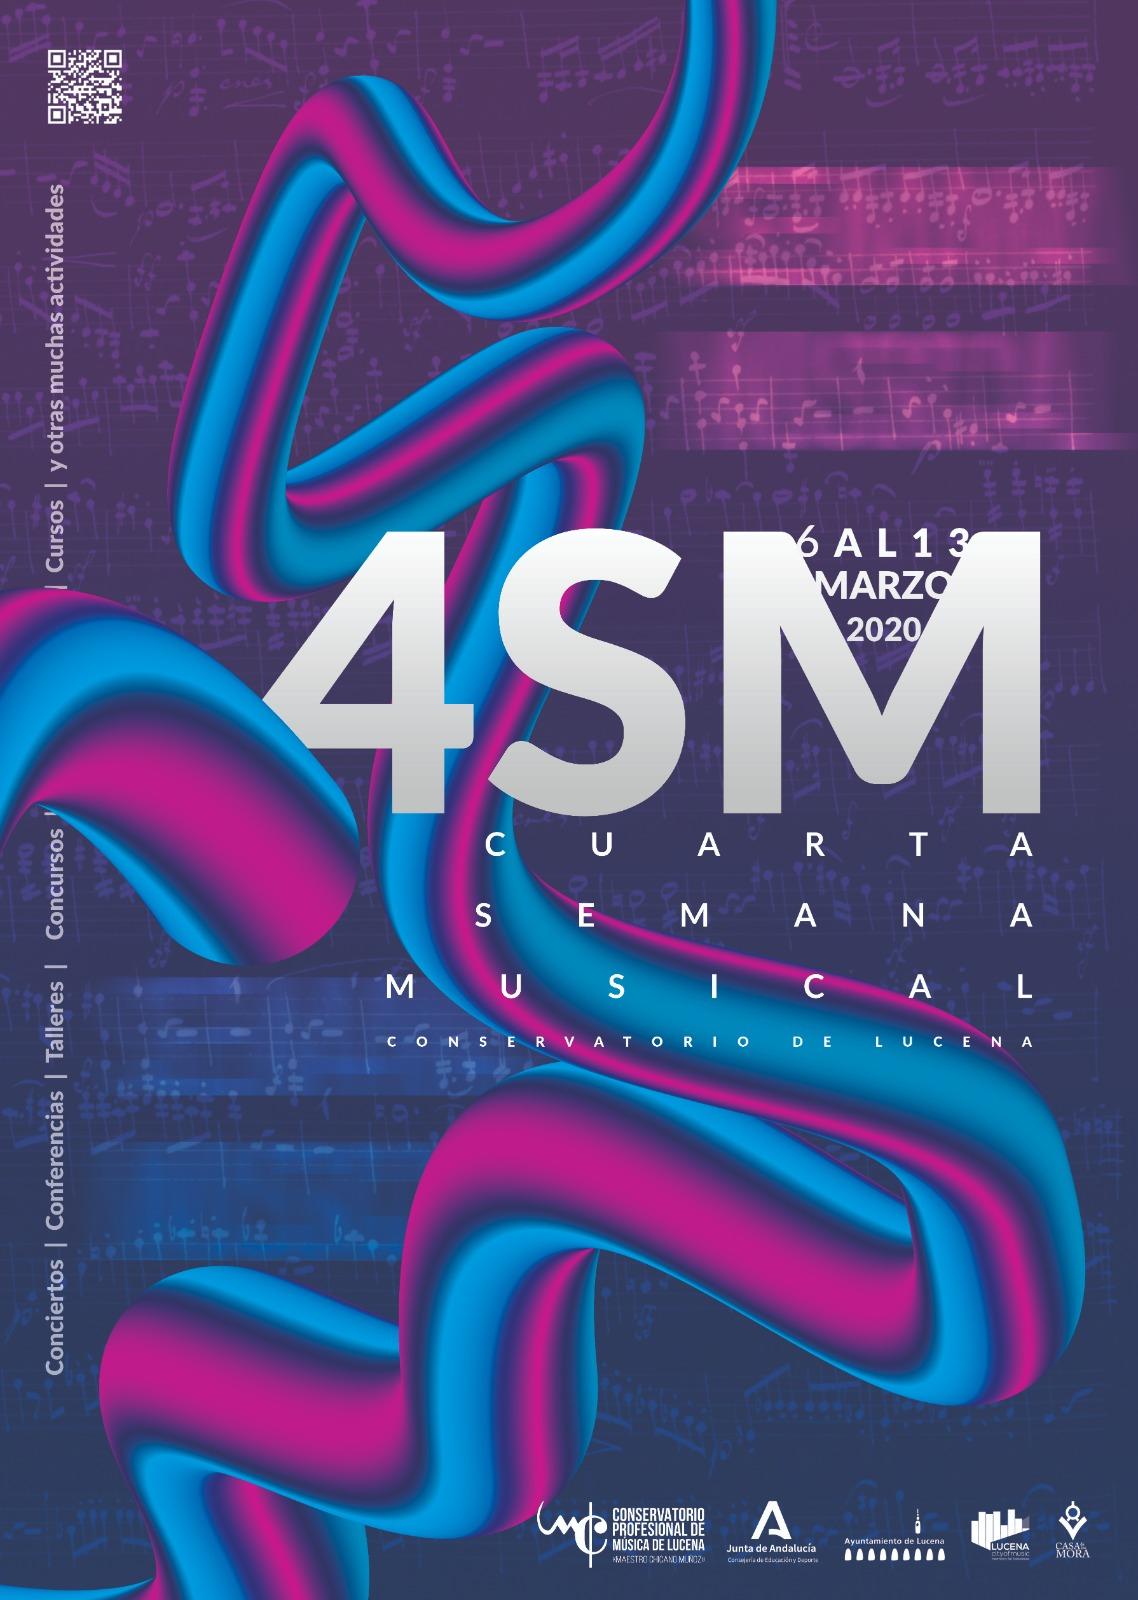 "La IV Semana Musical del C.P.M. ""Maestro Chicano Muñoz"" @ varios espacios"